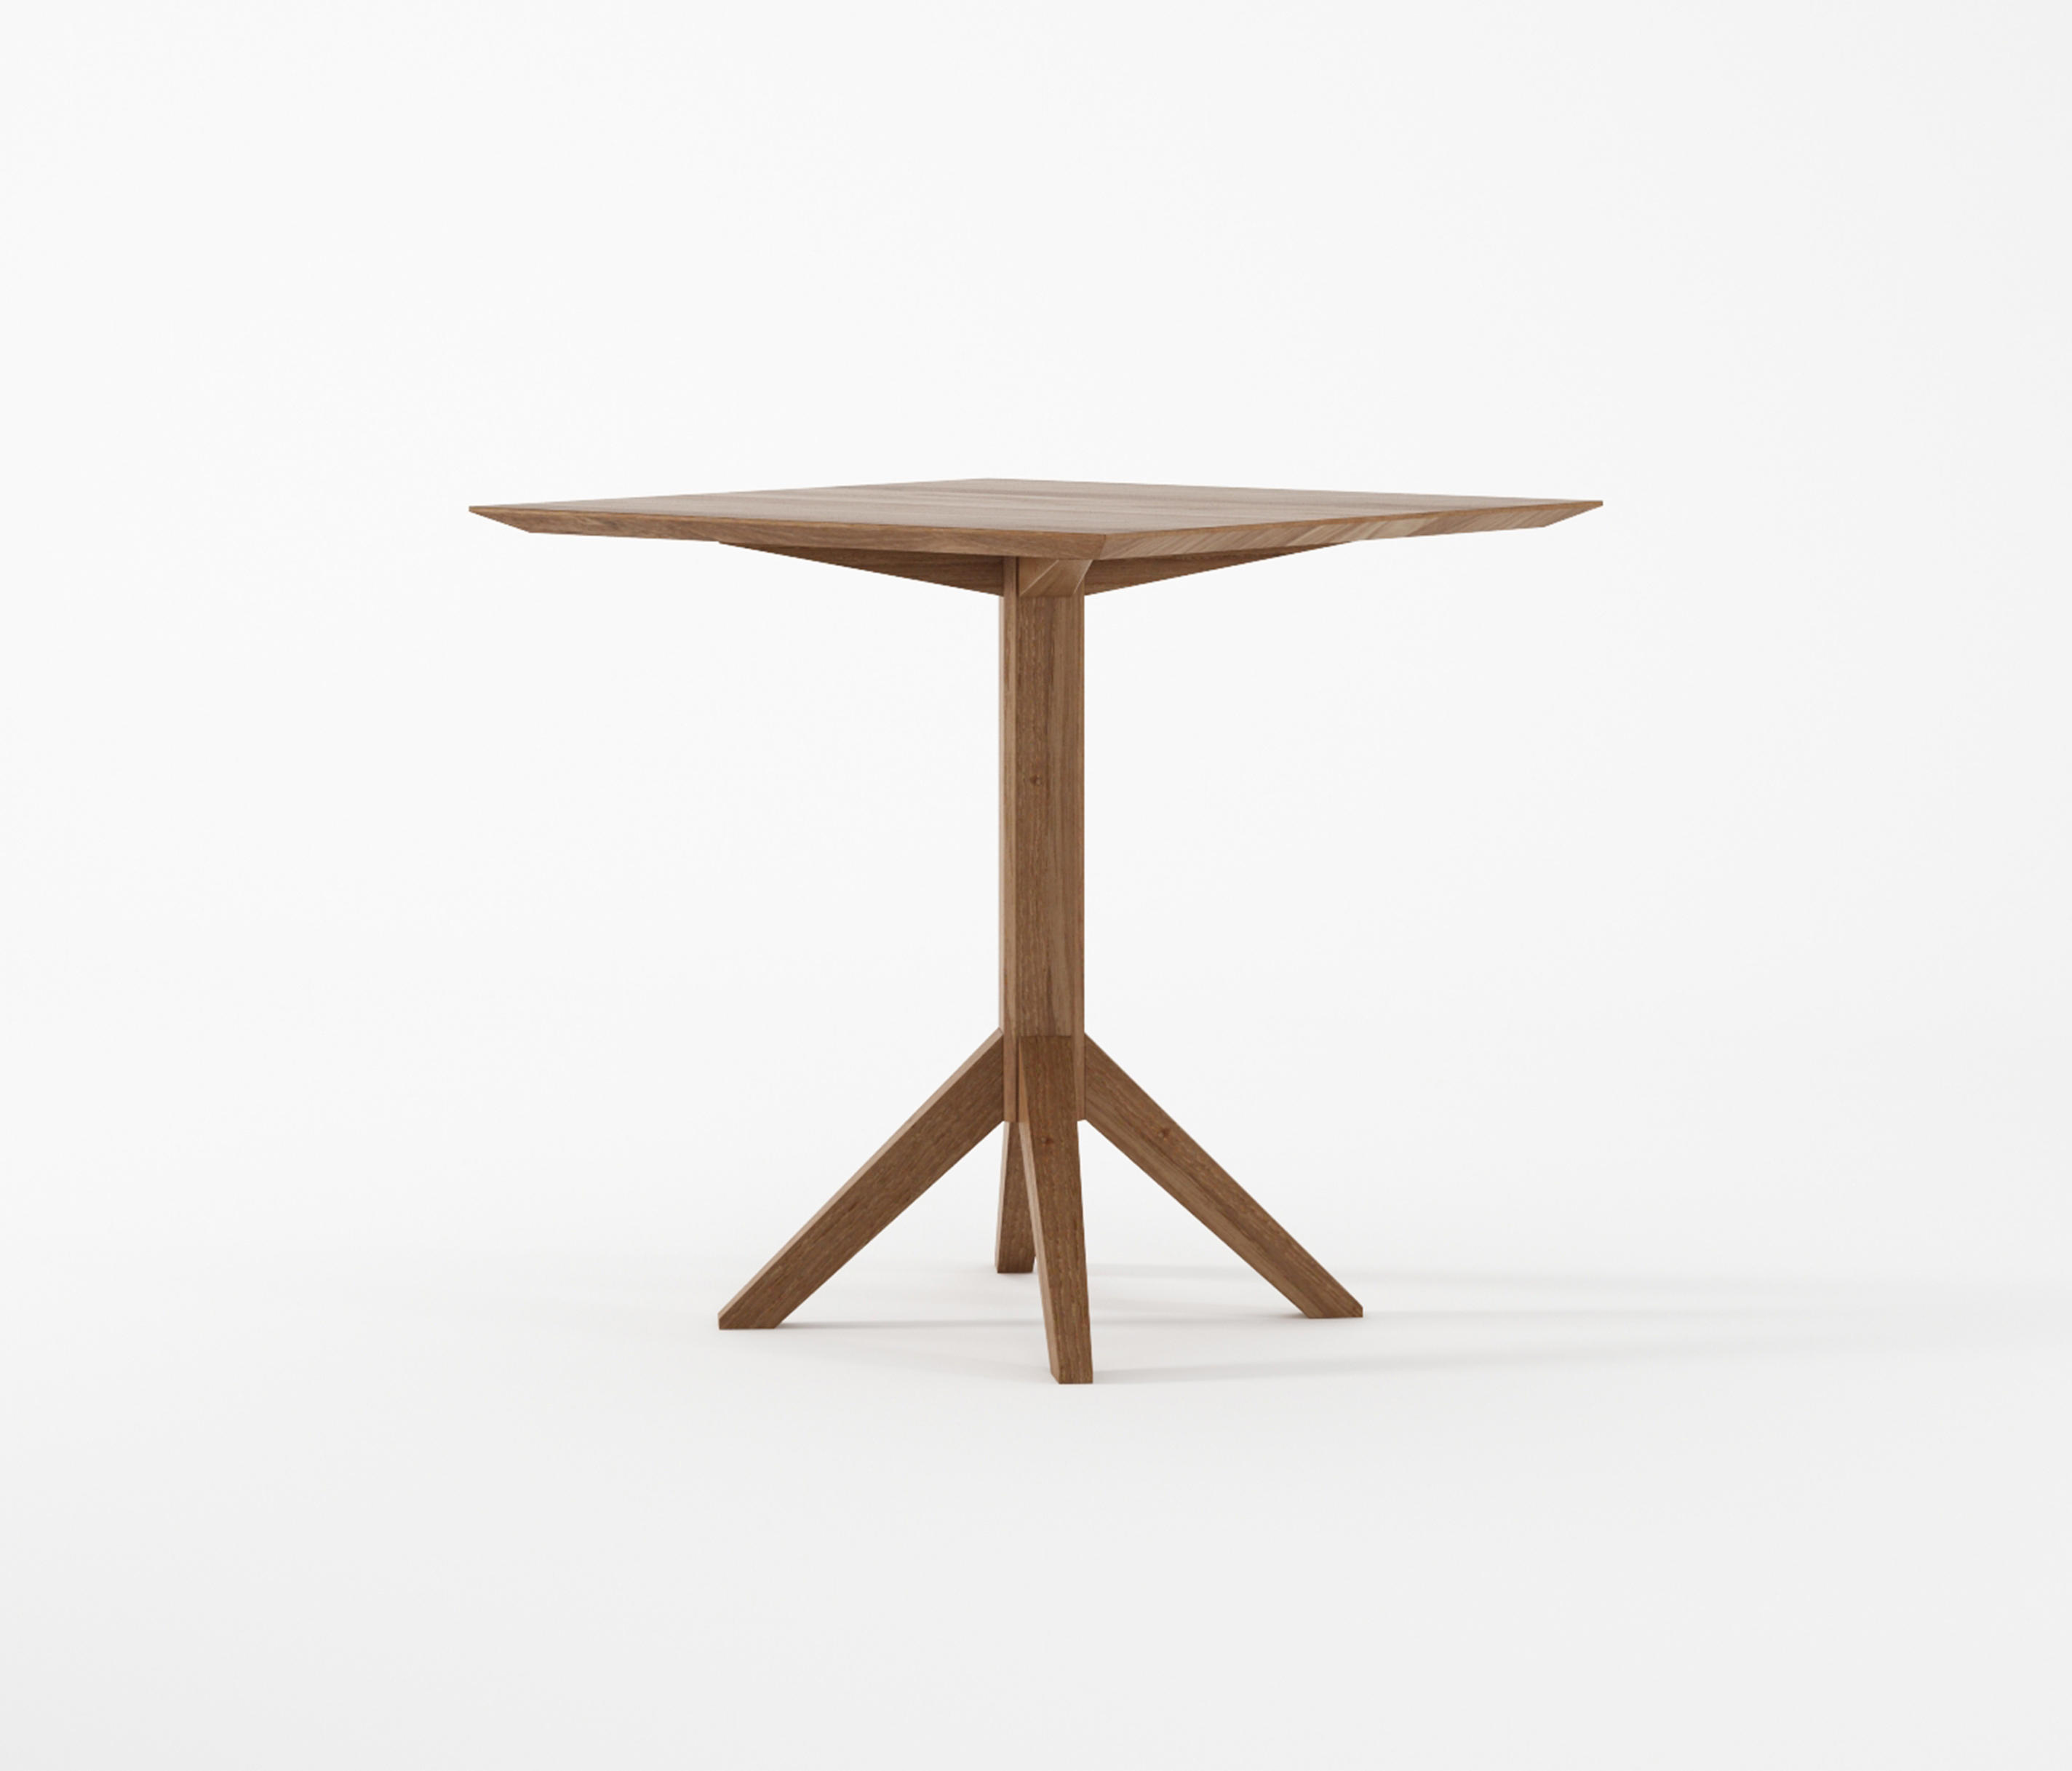 NEW BISTRO SQUARE BISTRO TABLE Bistro Tables From Karpenter - Square pedestal pub table